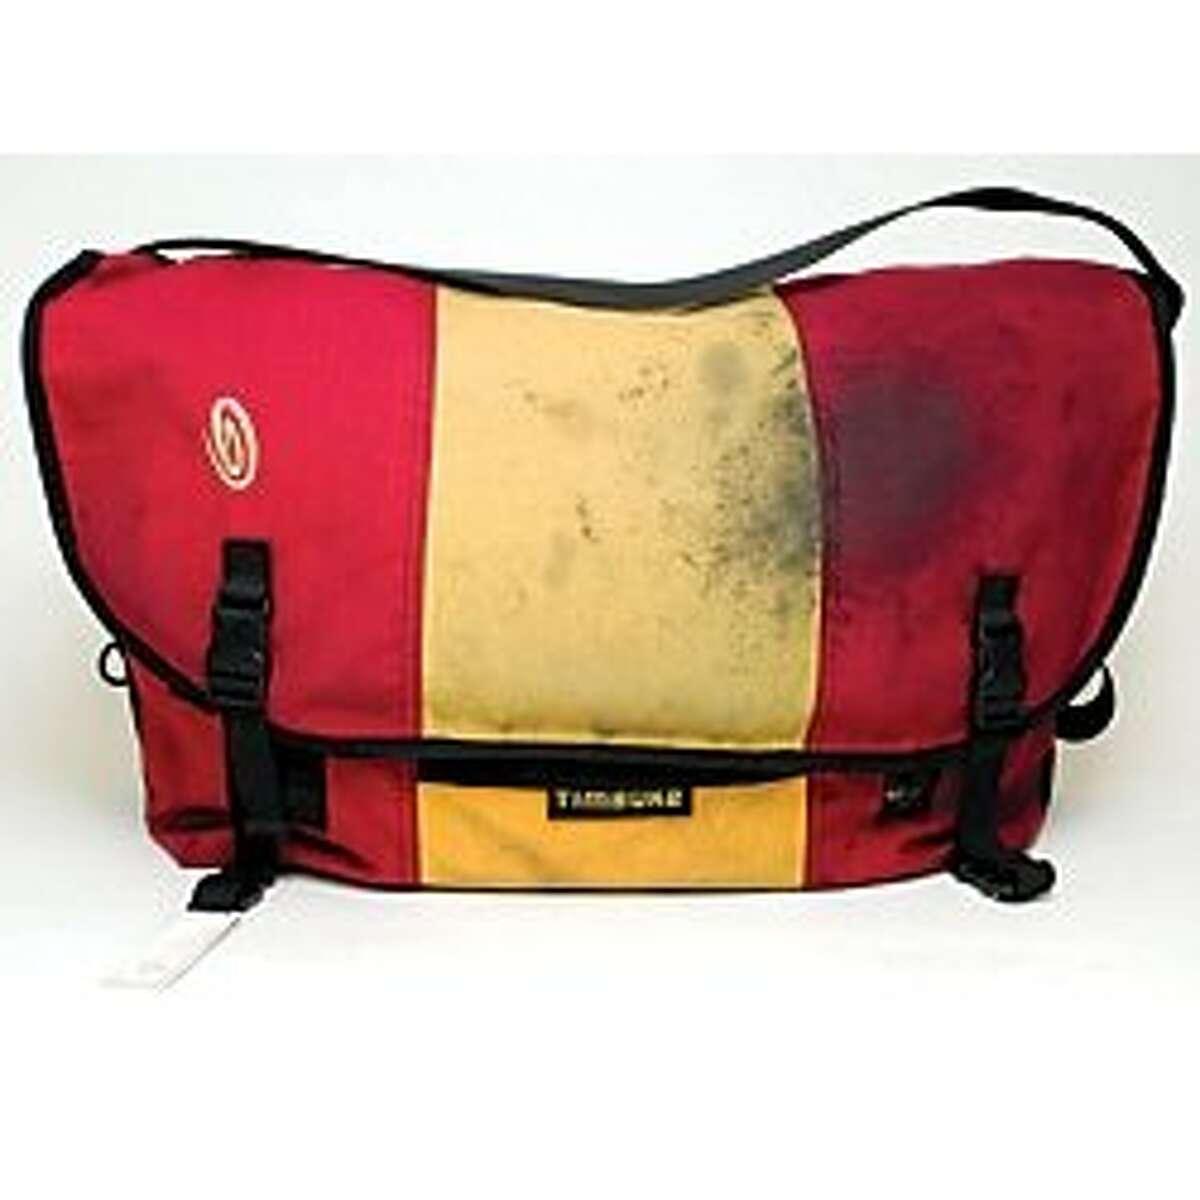 A old version of a Timbuk2 messenger bag.